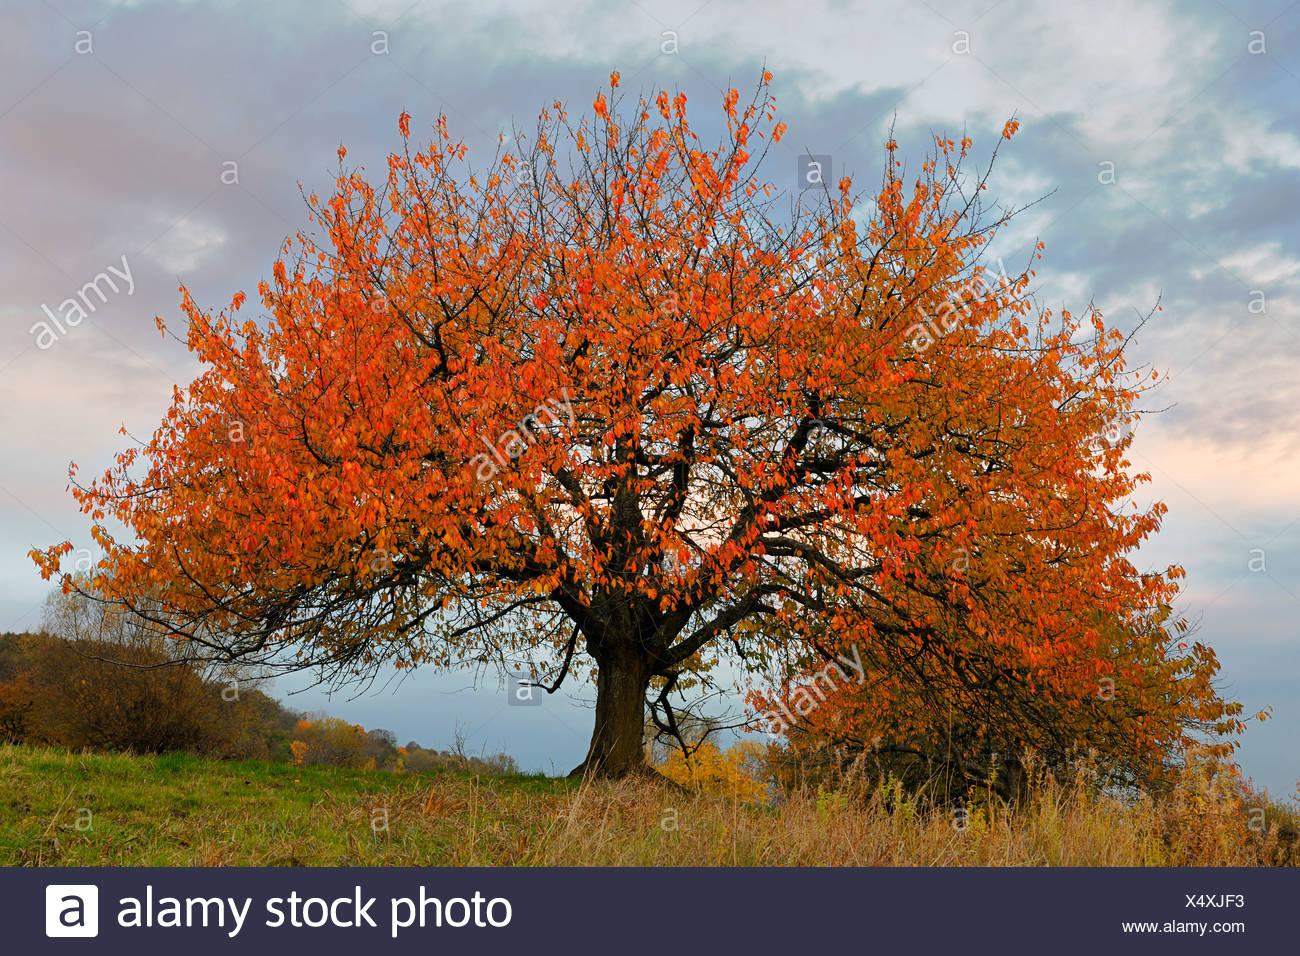 Autumnal cherry tree in the fading light, Biosphaerengebiet Swabian Alb biosphere region, Baden-Wuerttemberg, Germany, Europe - Stock Image